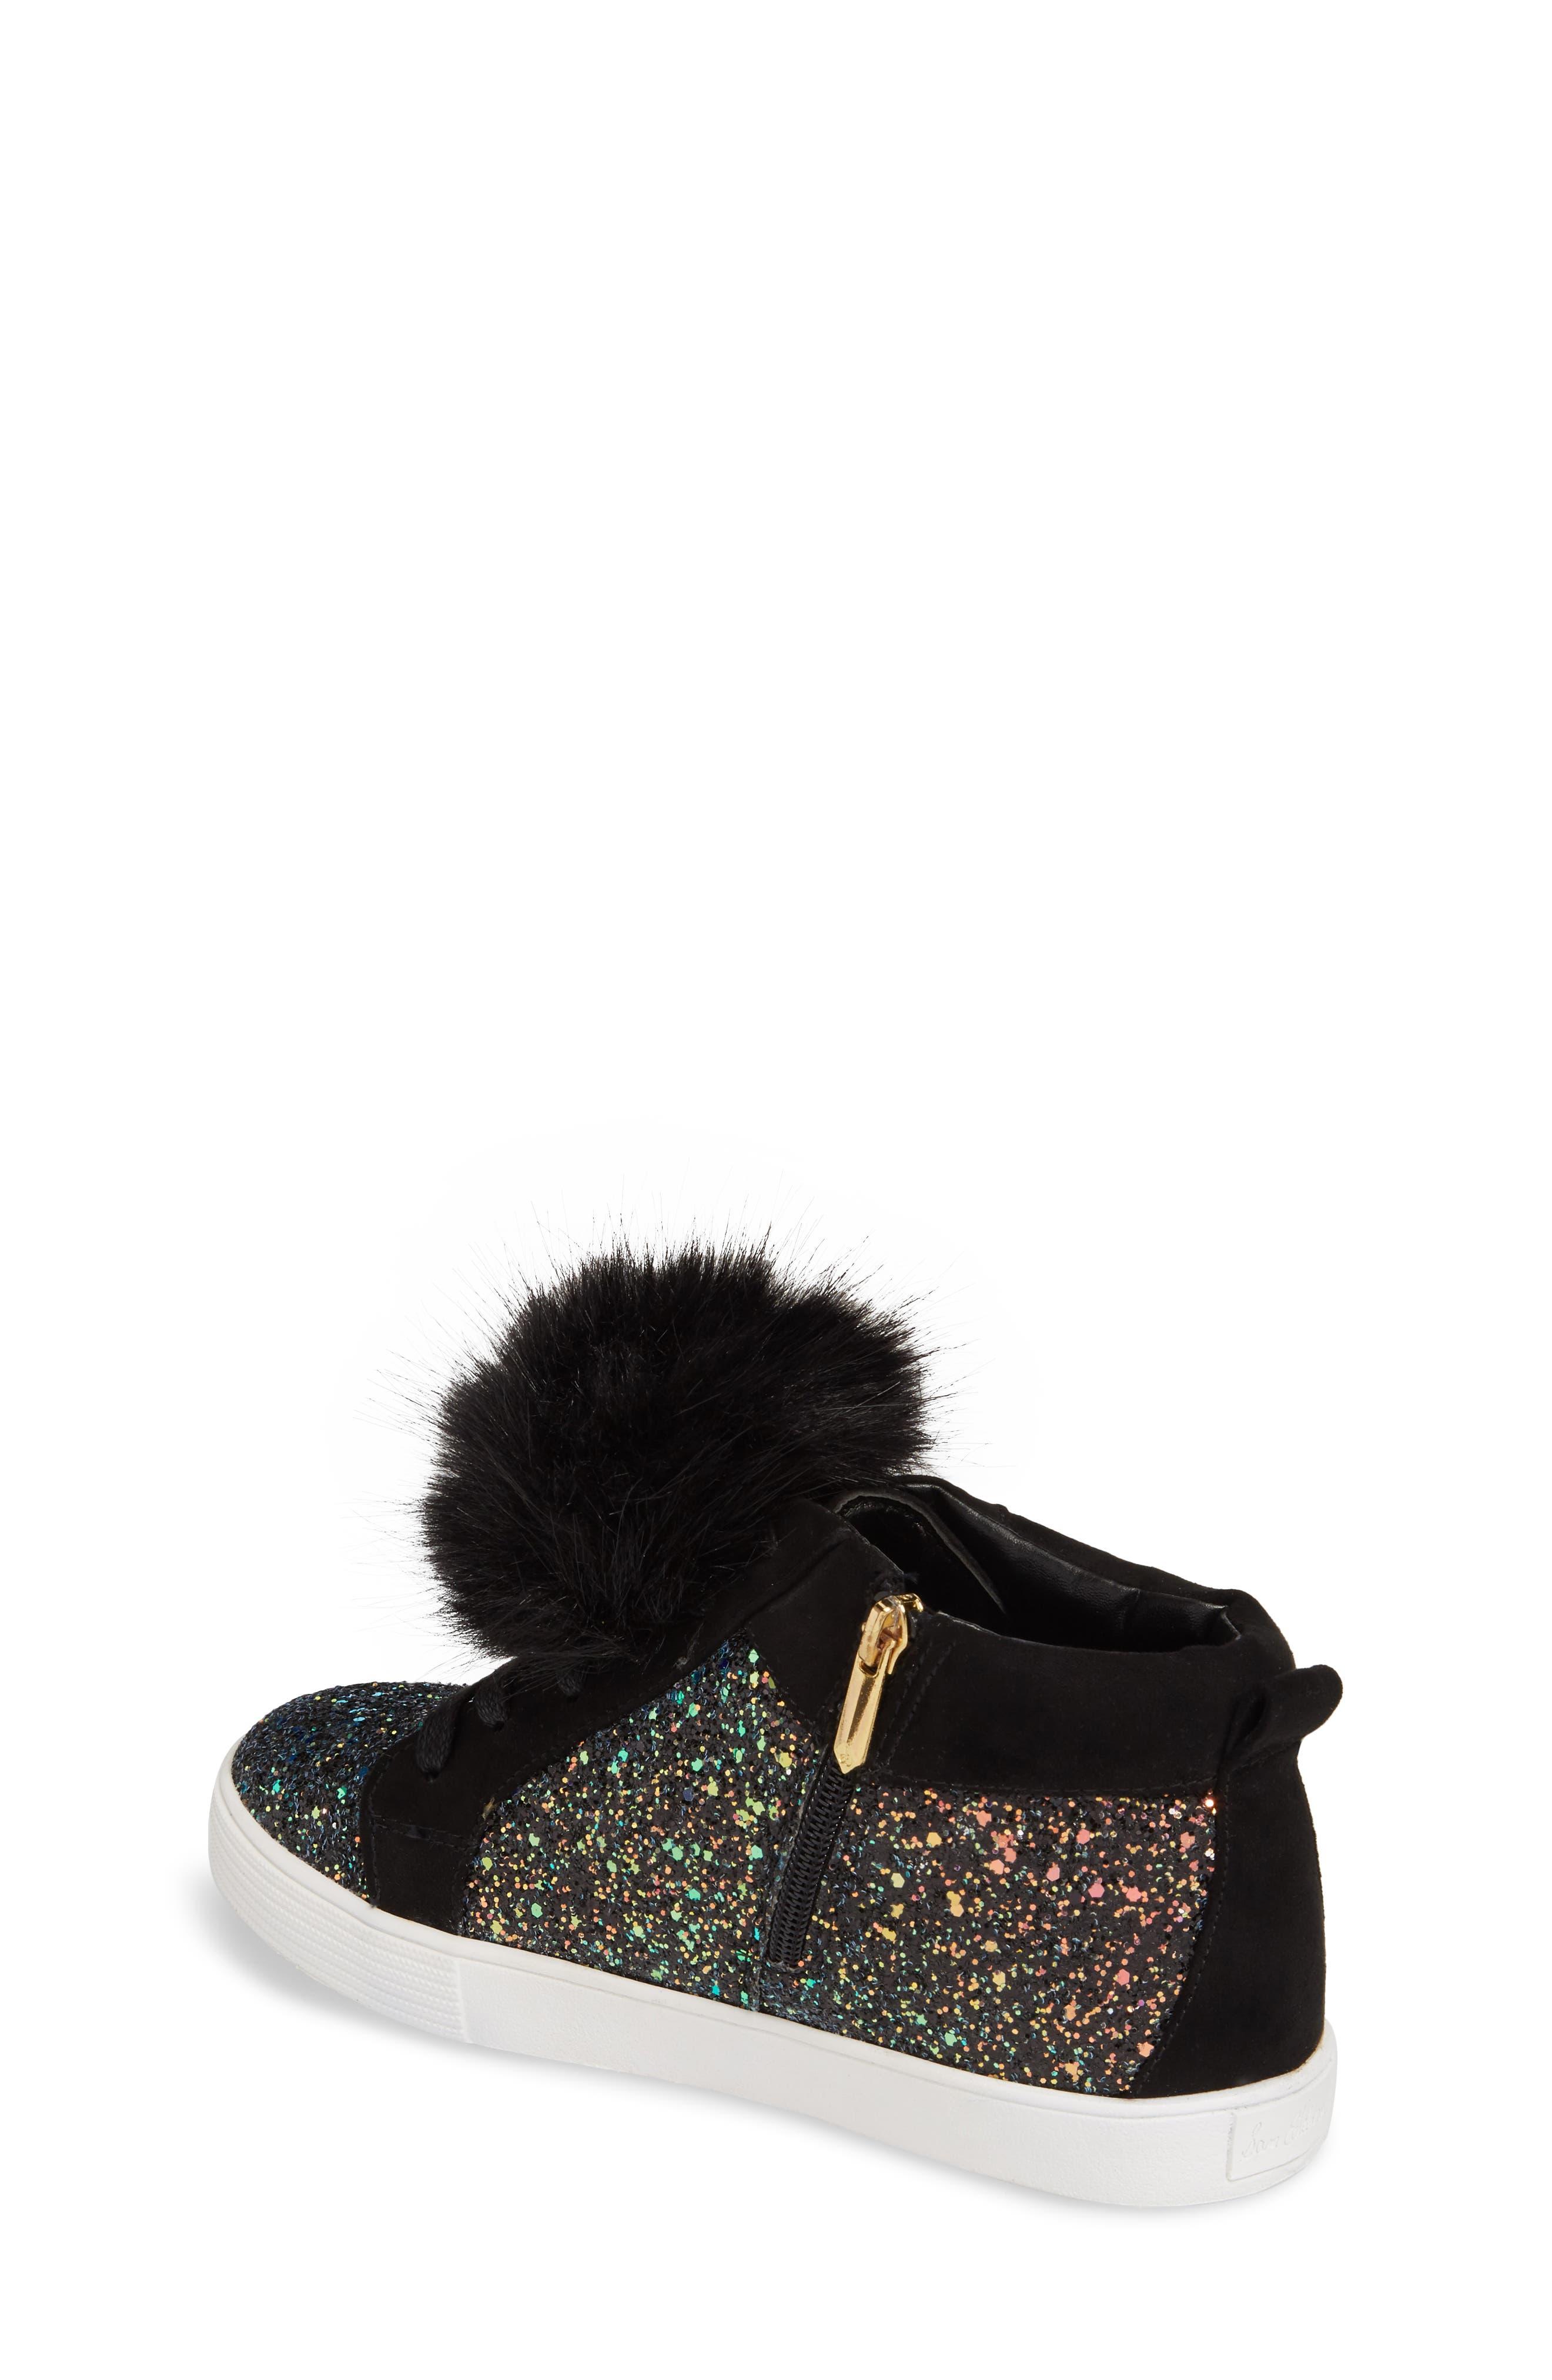 Bella Hira Faux Fur Glitter Pom Sneaker,                             Alternate thumbnail 2, color,                             Black Multi Chunky Glitter